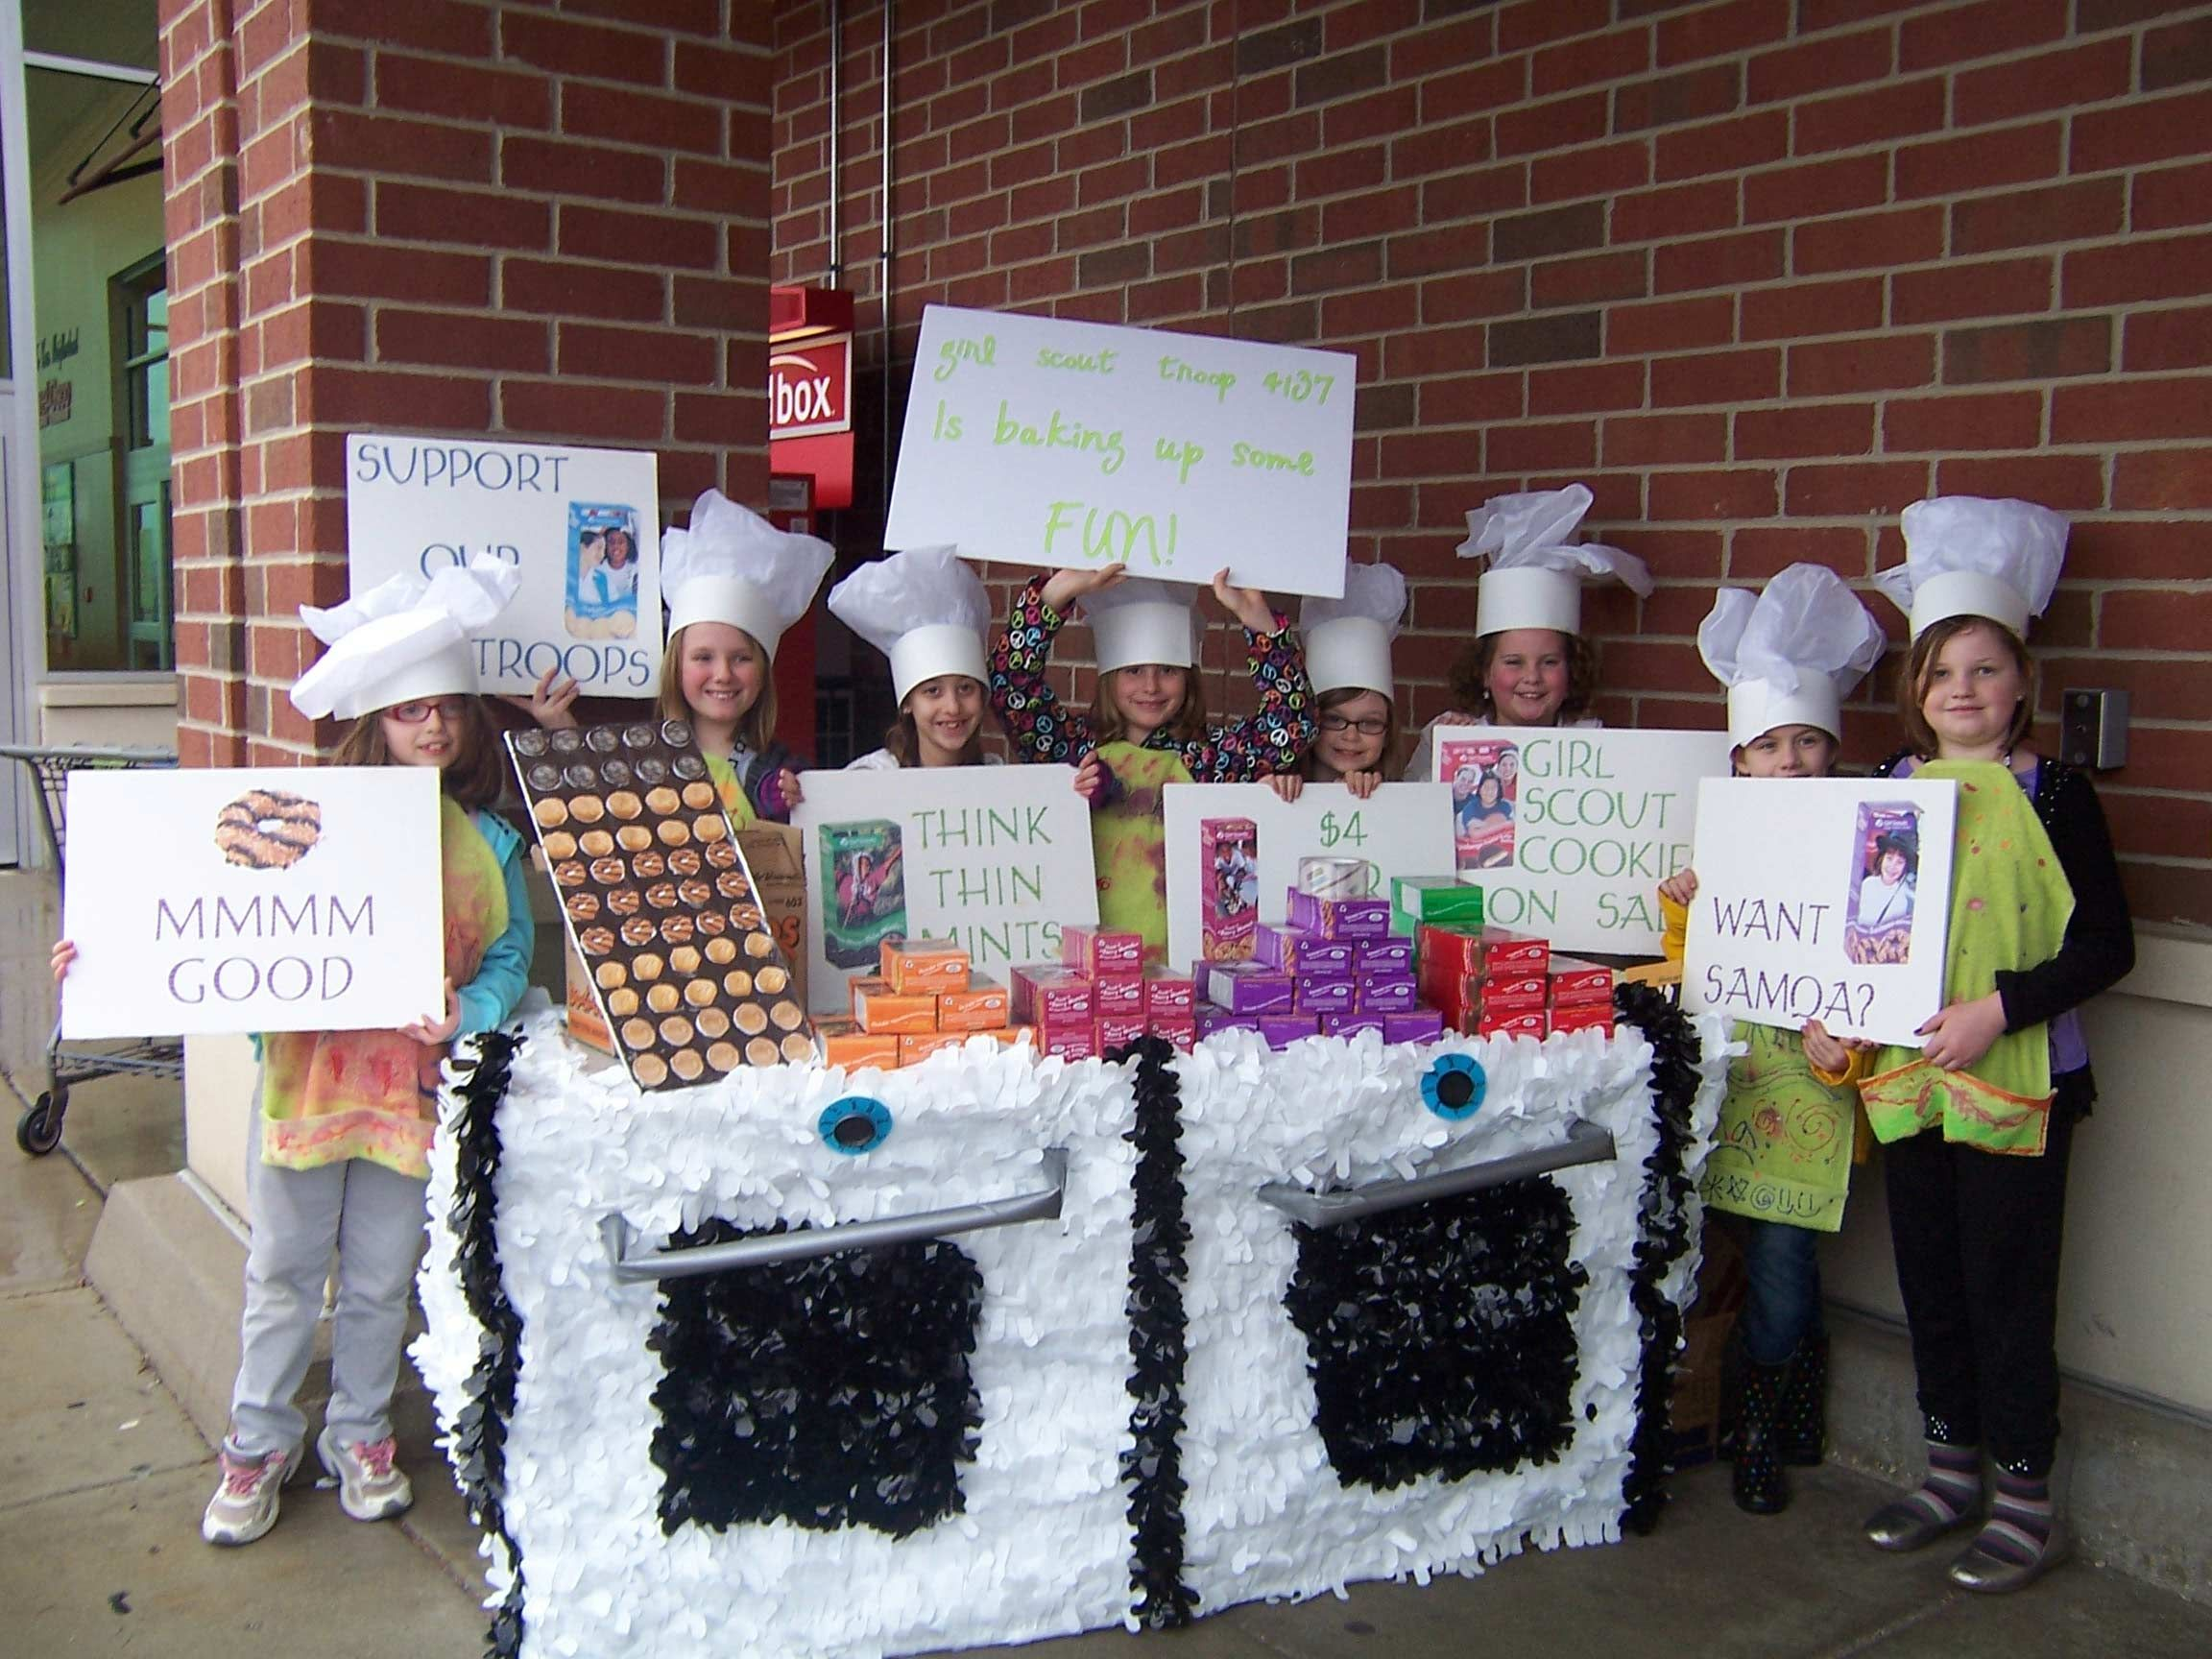 Girl scout scrapbook ideas - Cute Girl Scout Cookie Booth Idea